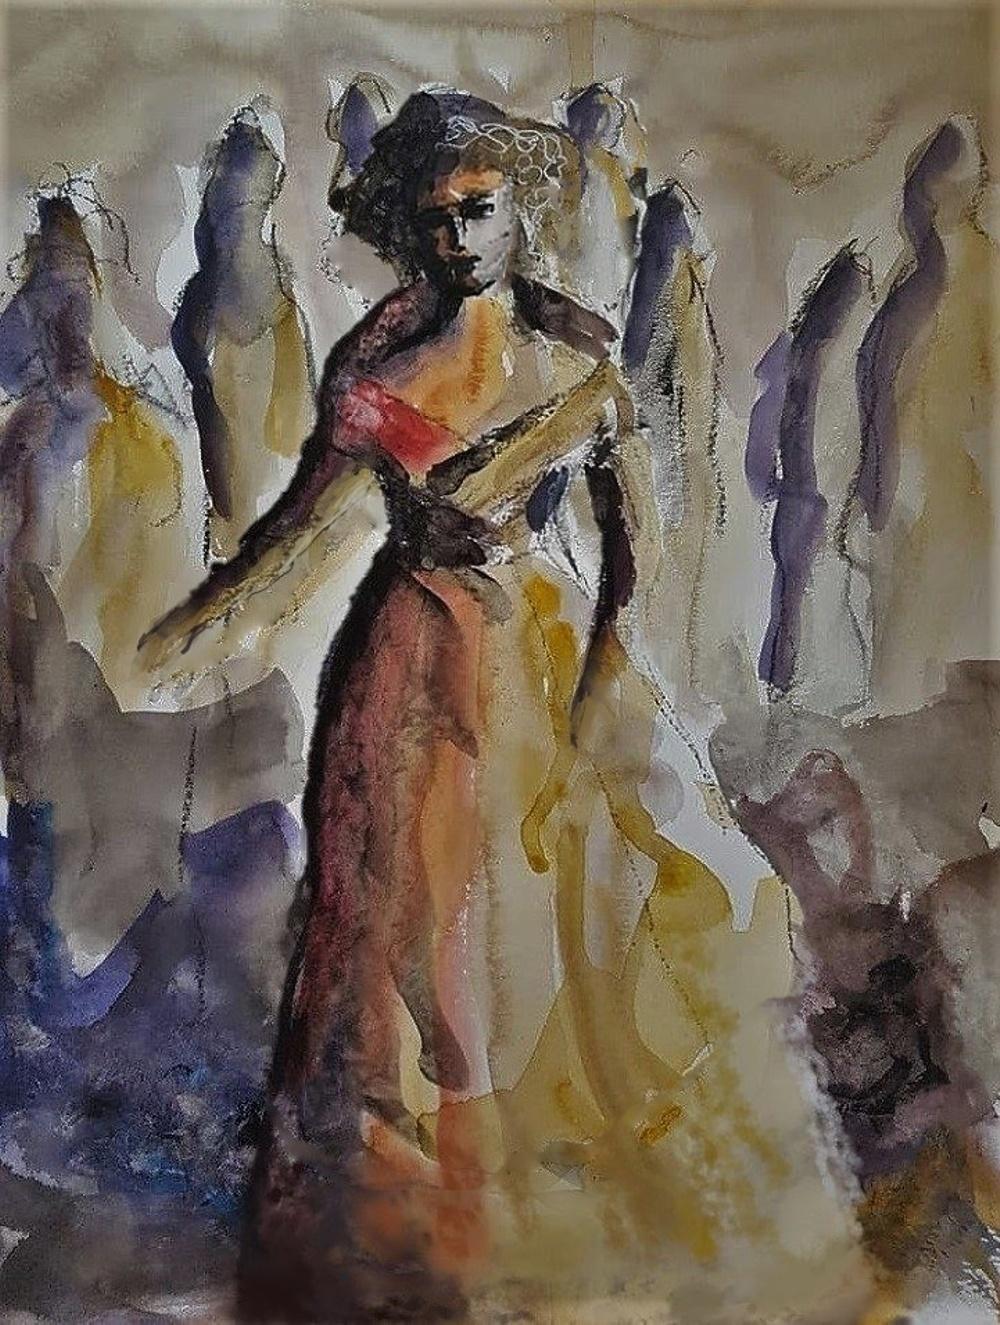 Illustration: Lotta Allard